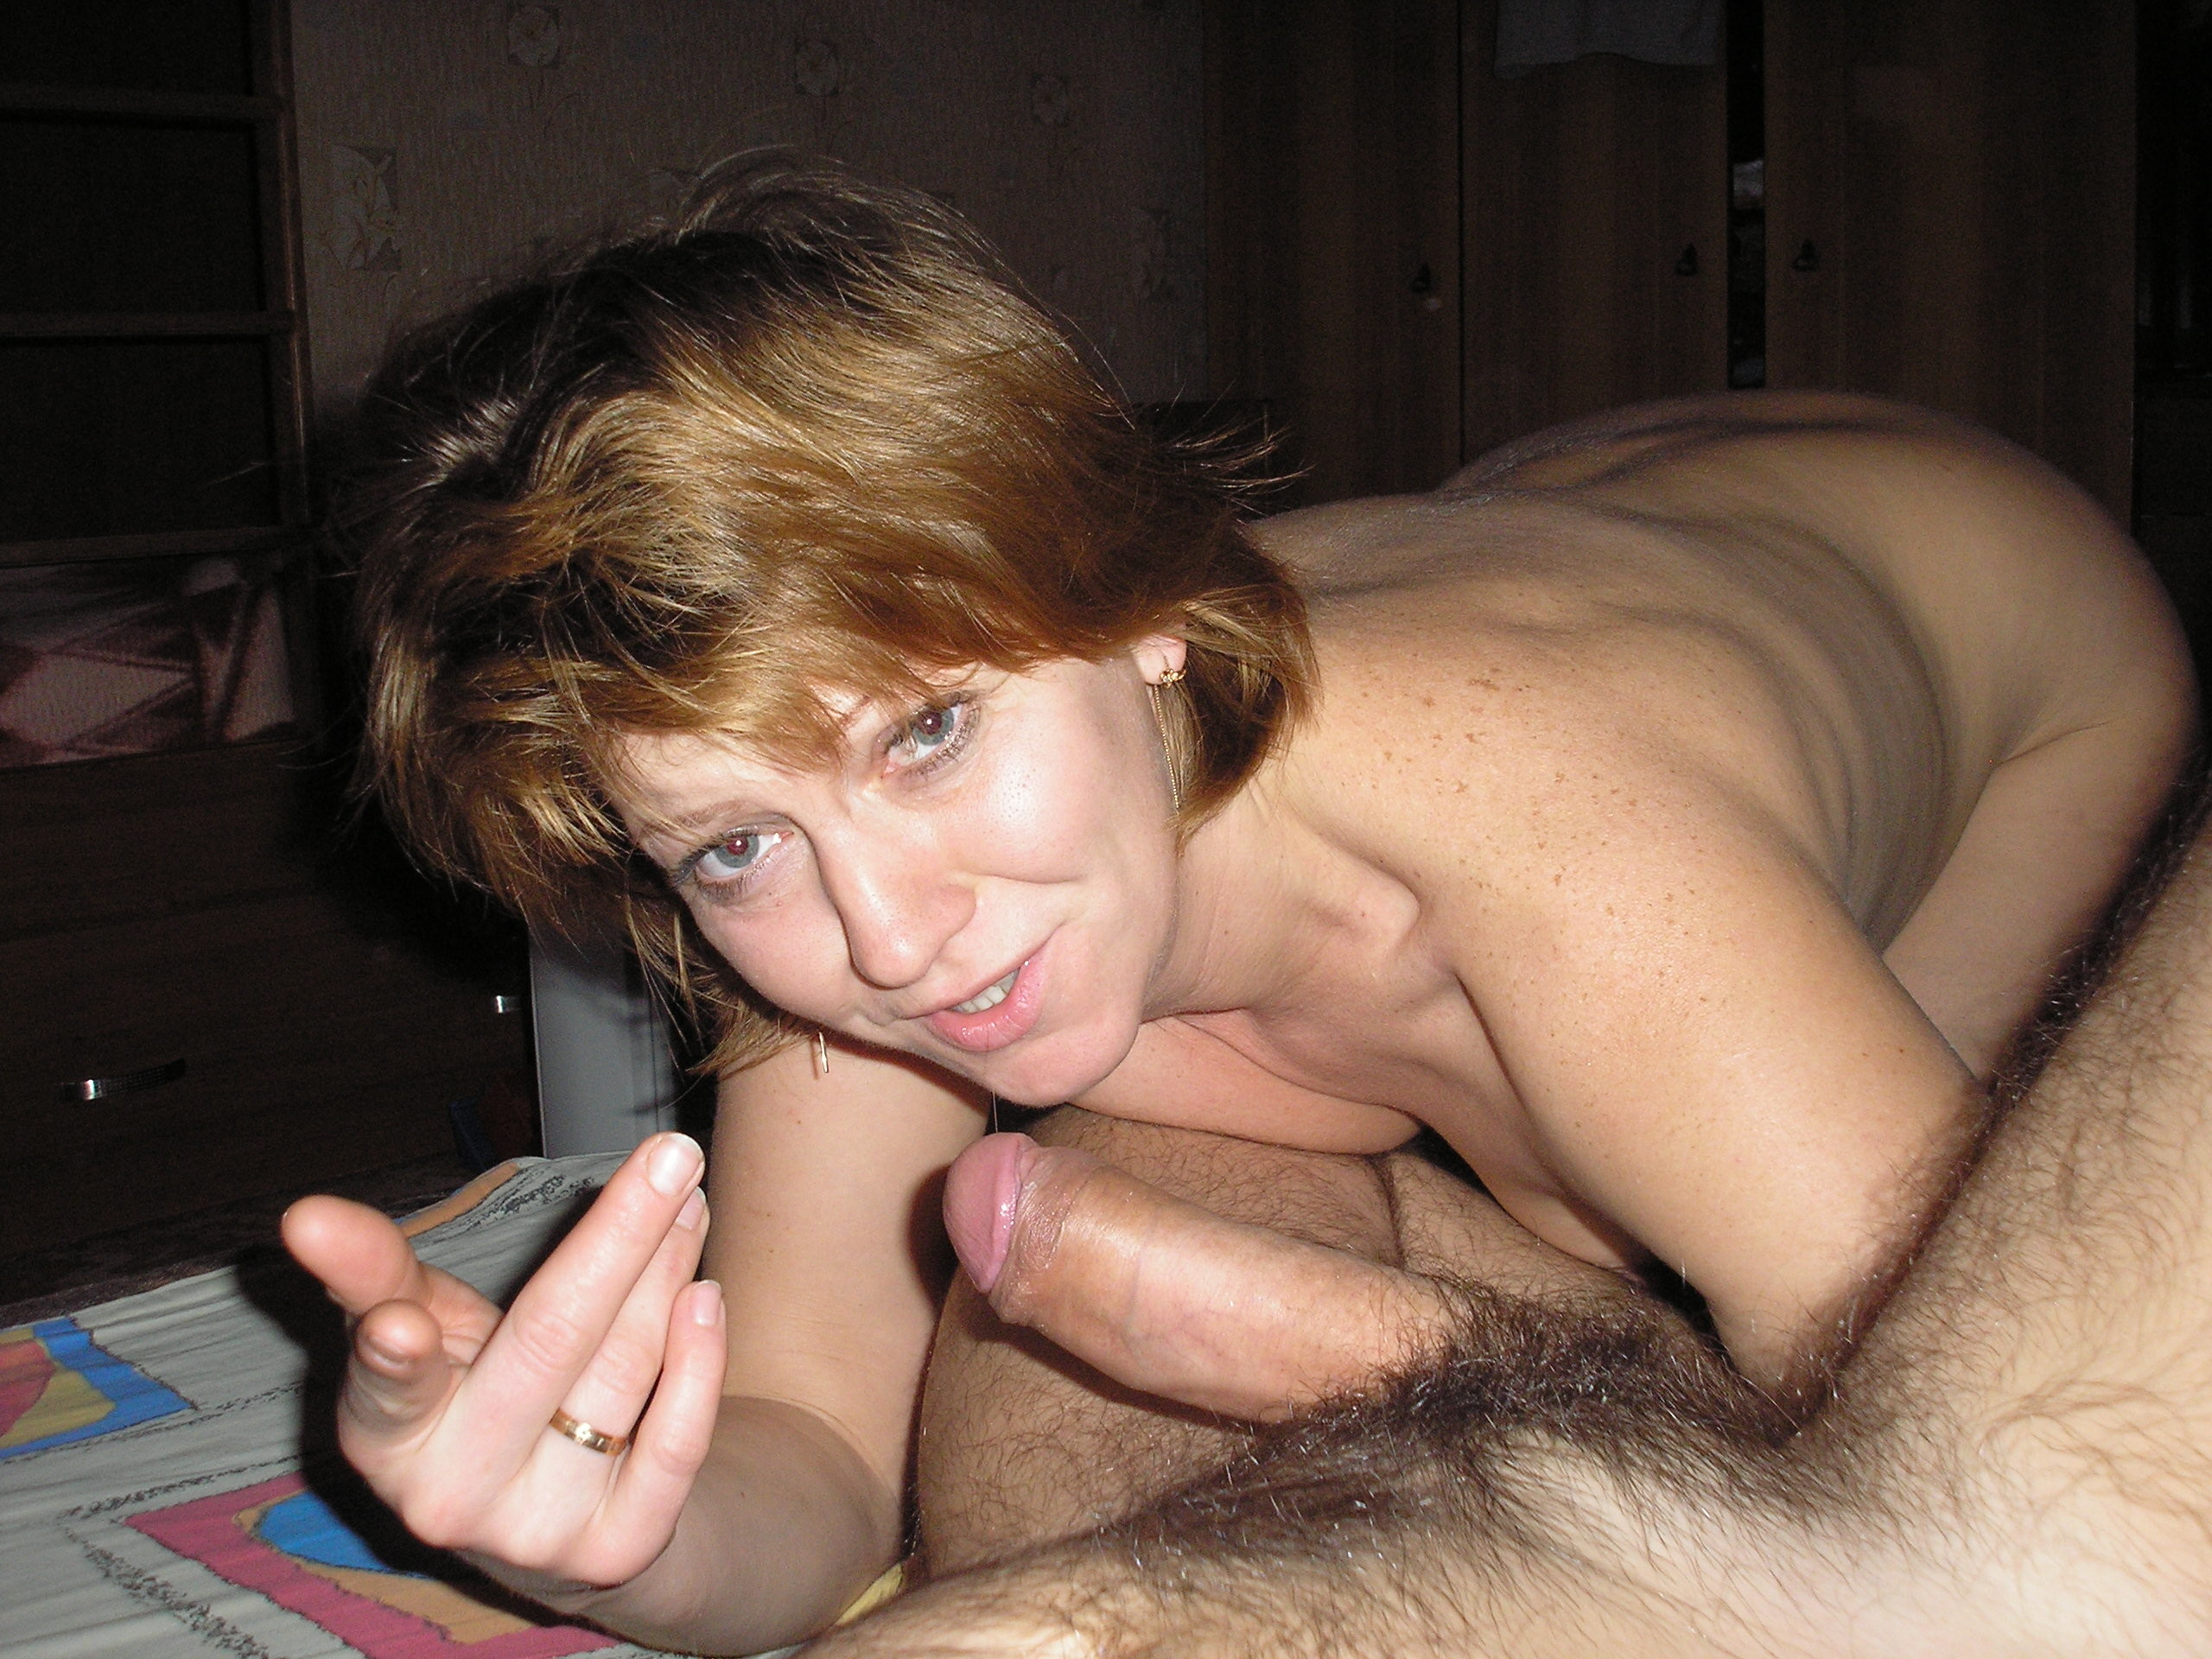 Зрелая русская дама хочет ебли